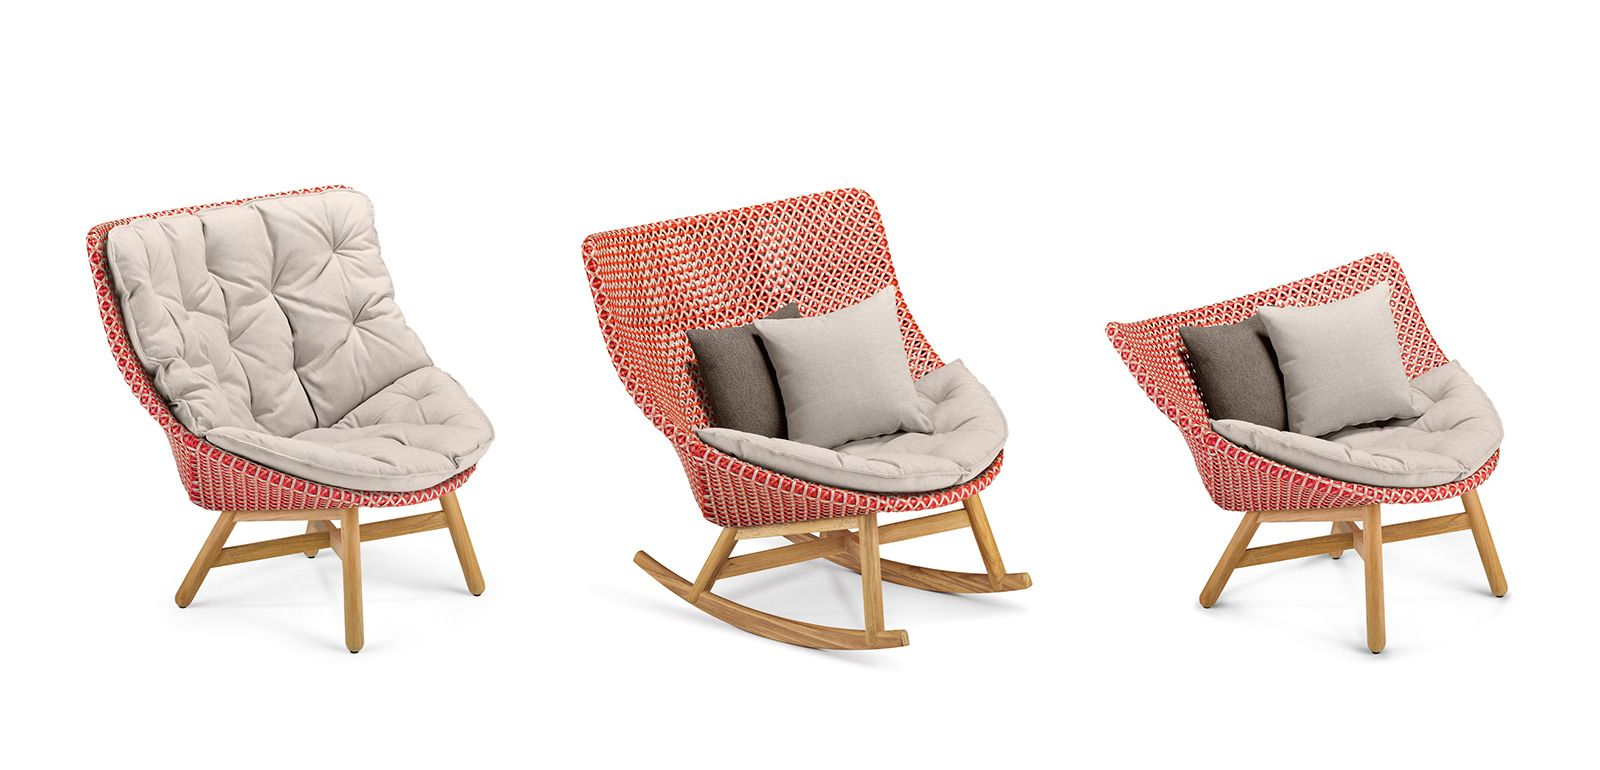 tendances 2016 du mobilier de jardin silvera. Black Bedroom Furniture Sets. Home Design Ideas